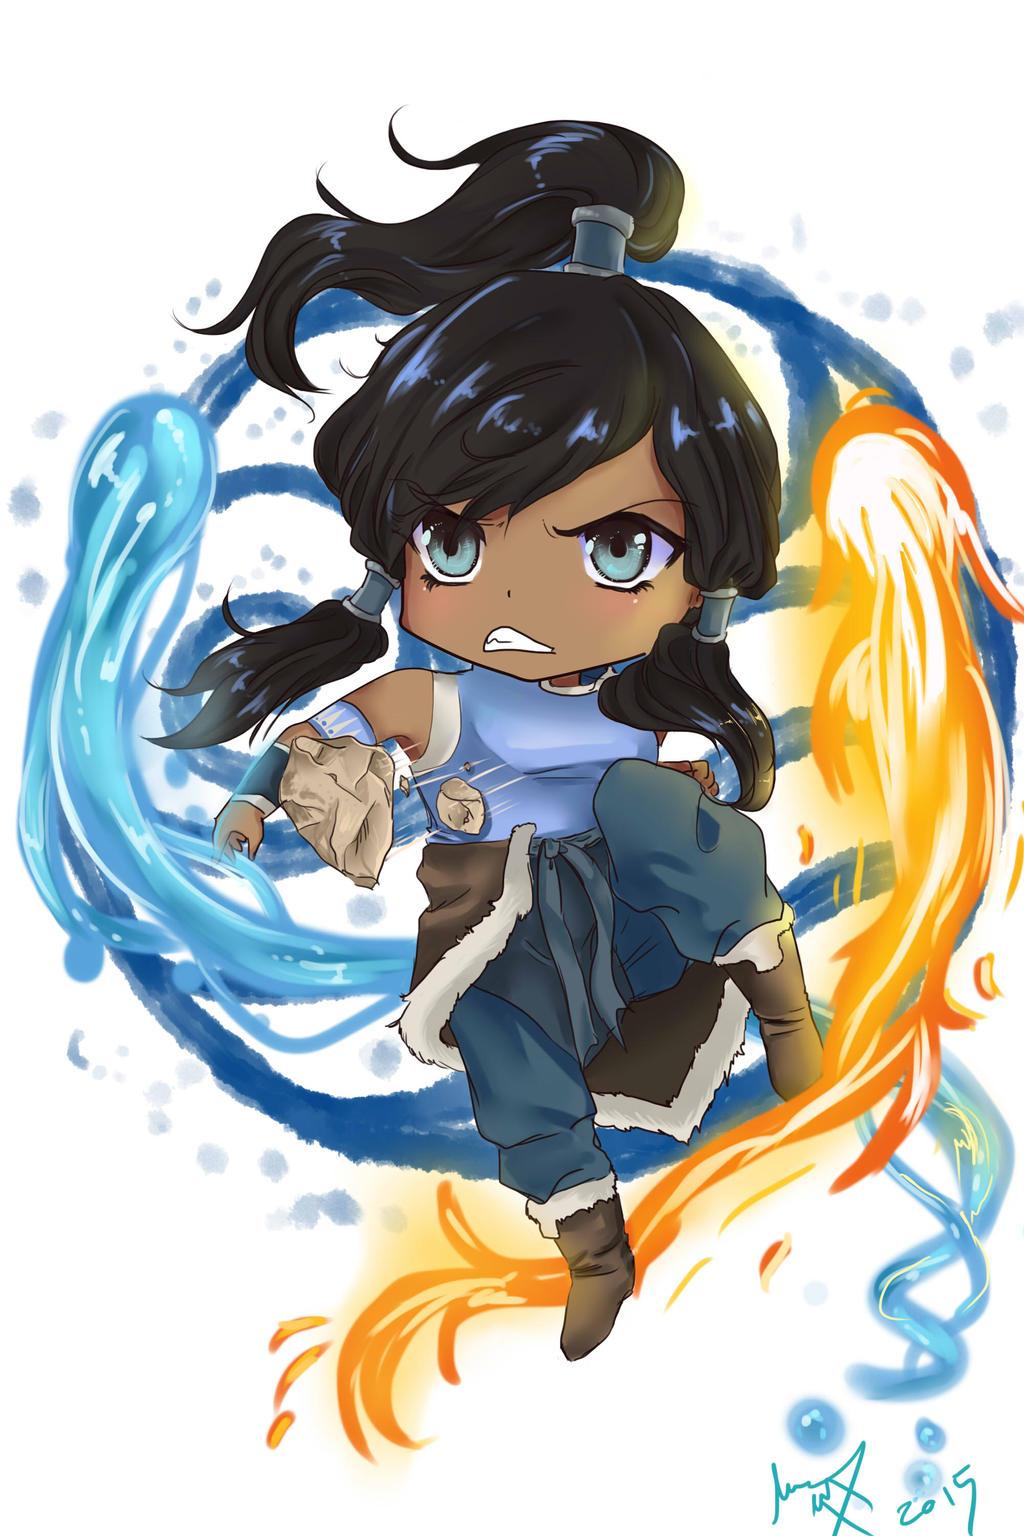 Watch Avatar: The Legend of Korra Episode 5 at Gogoanime